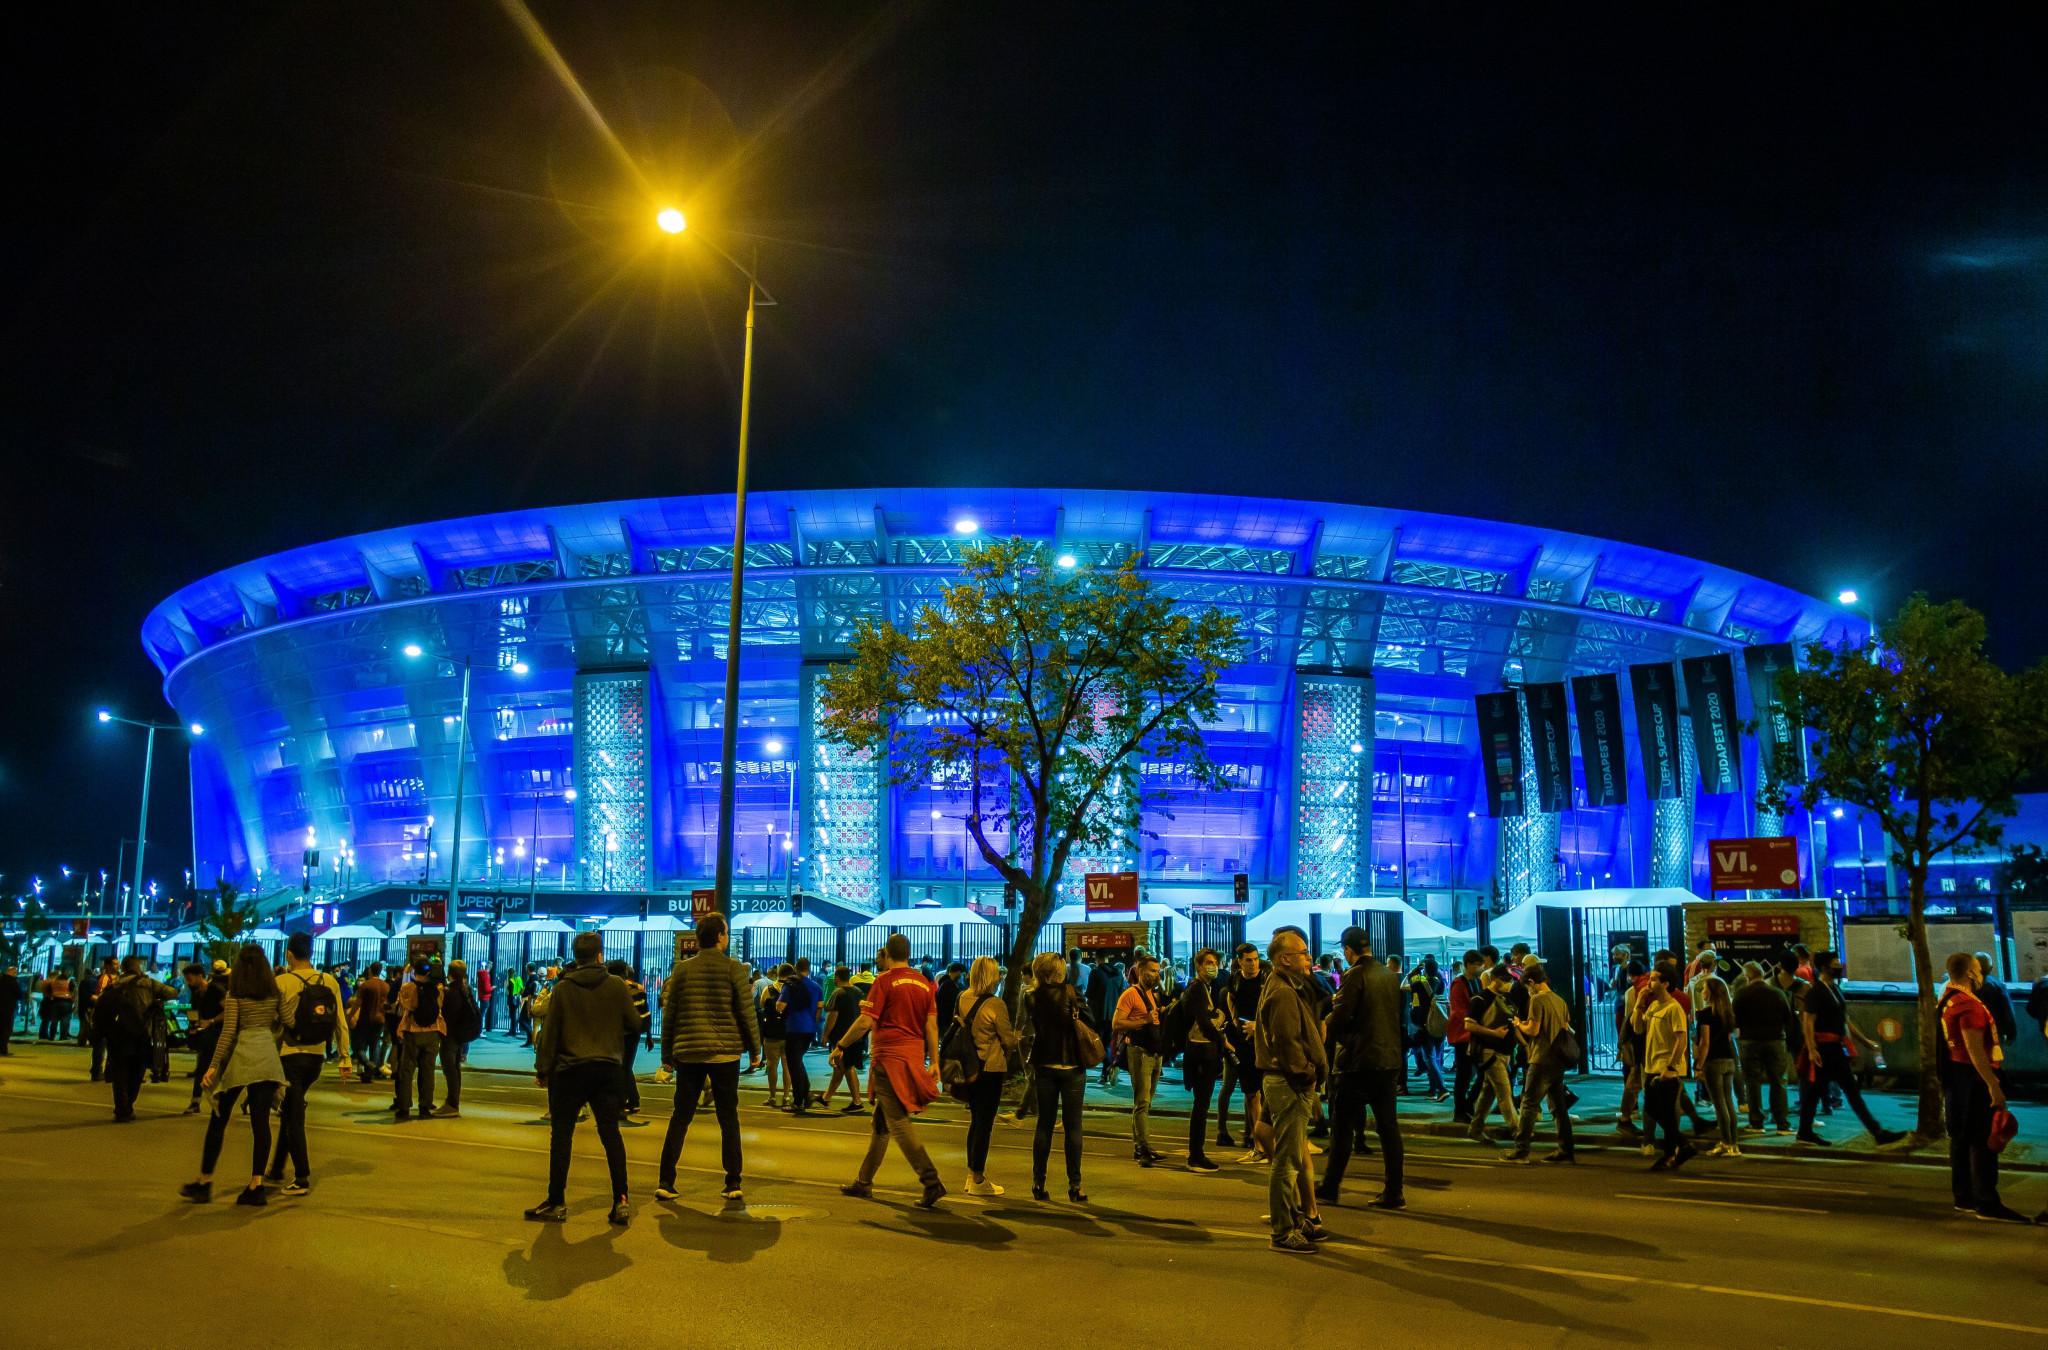 Budapest's Puskás Aréna will be full to capacity at Euro 2020 despite the coronavirus crisis, UEFA says ©Getty Images